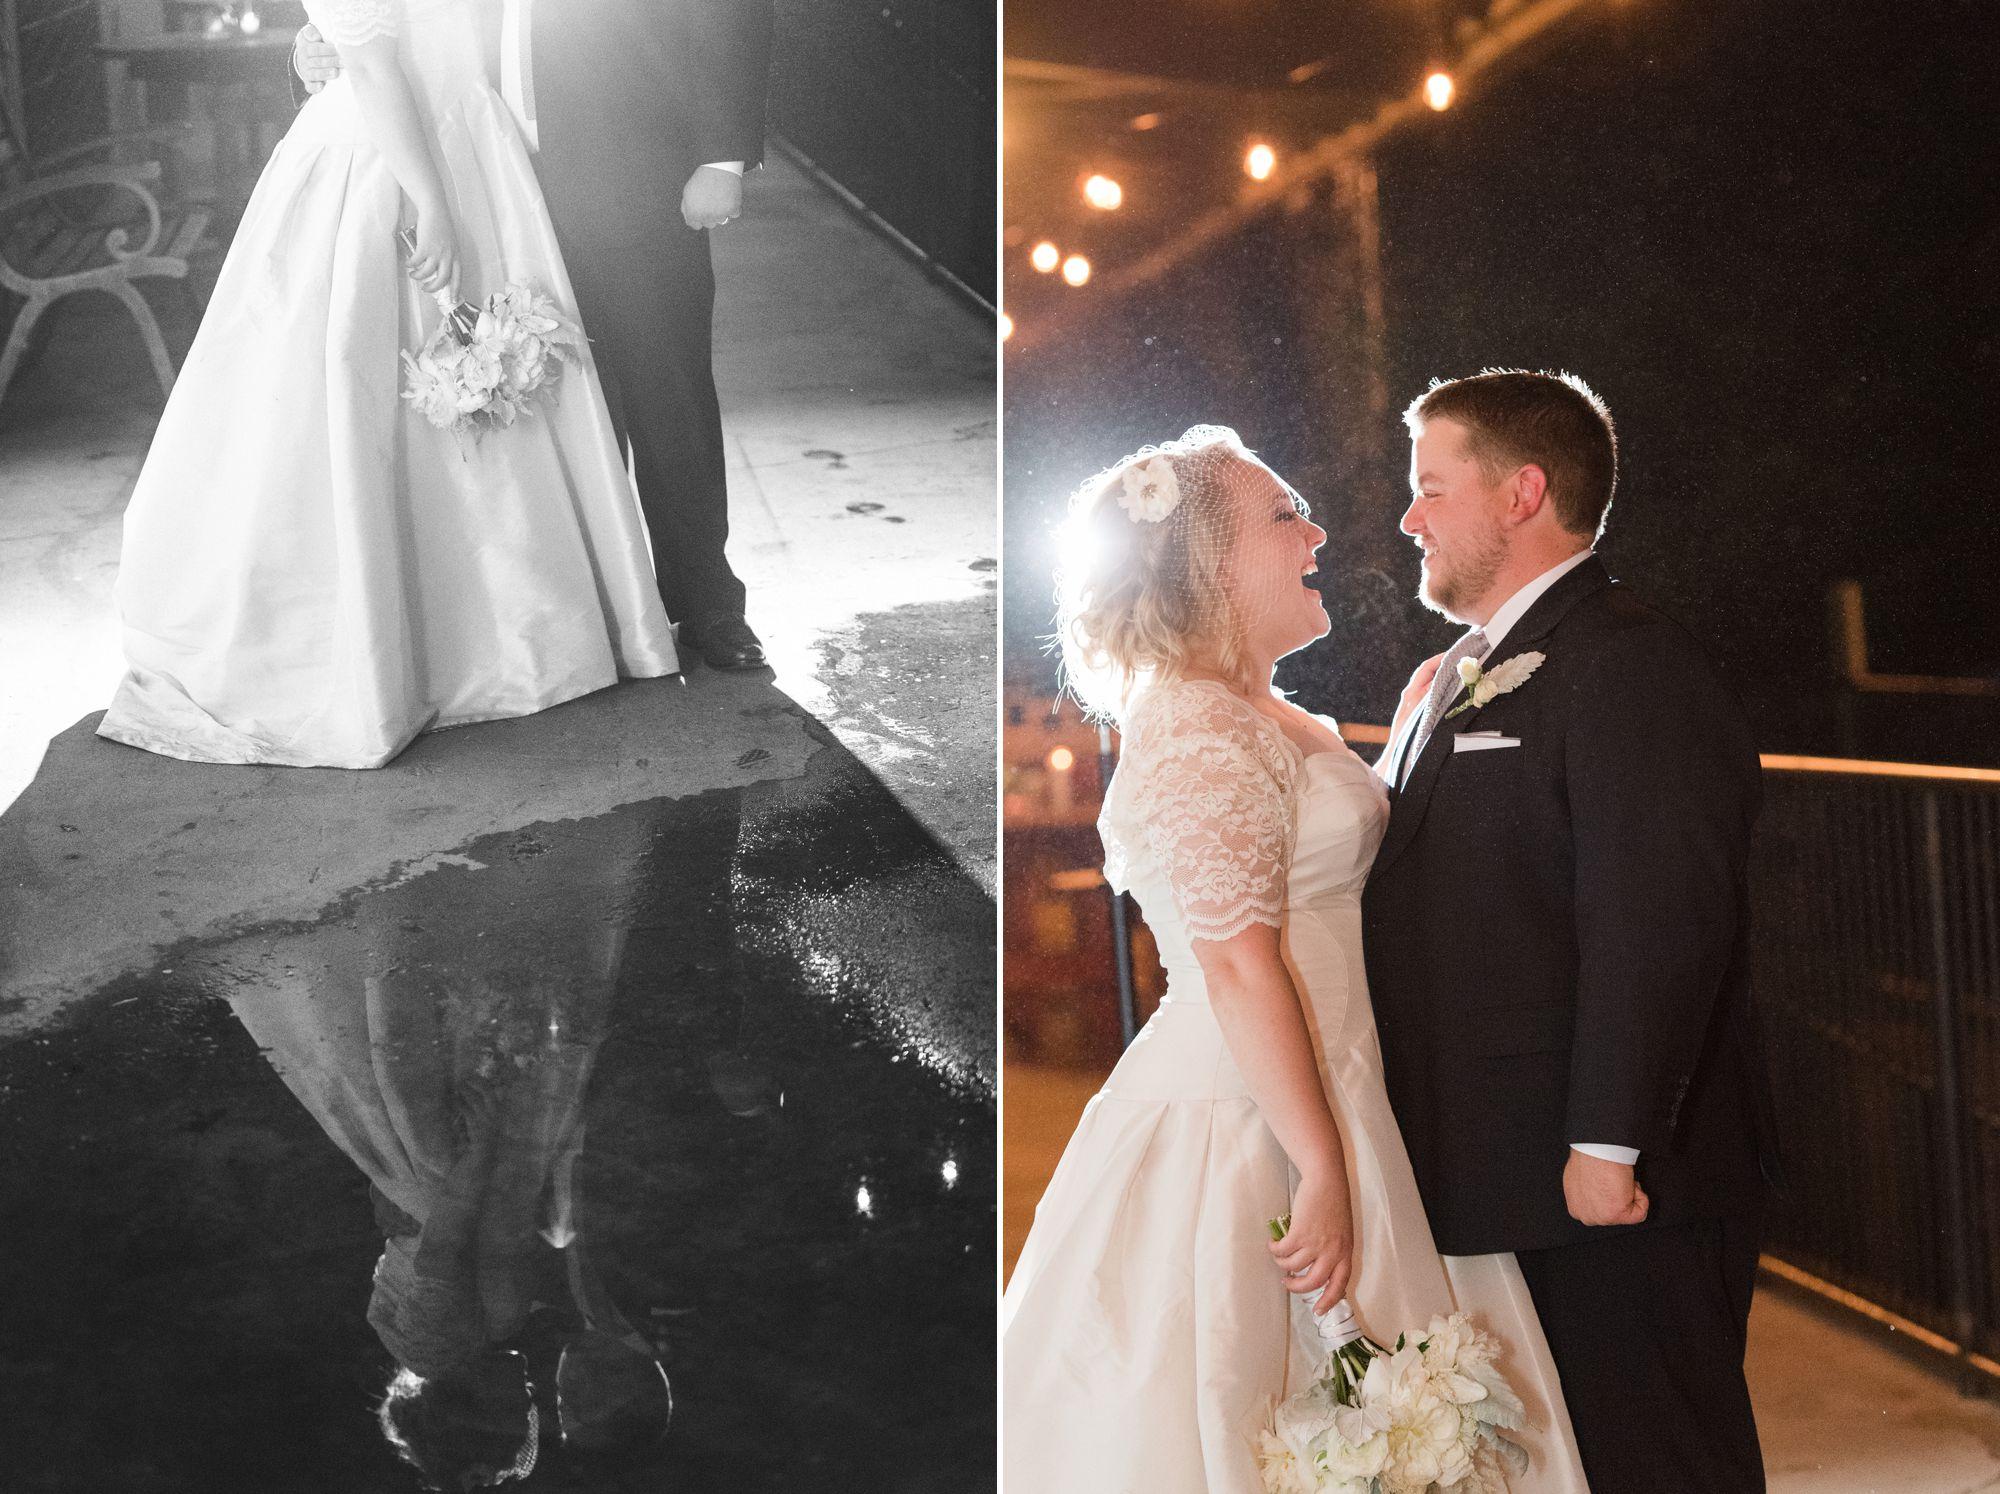 uptown-charlotte-warhouse-wedding 97